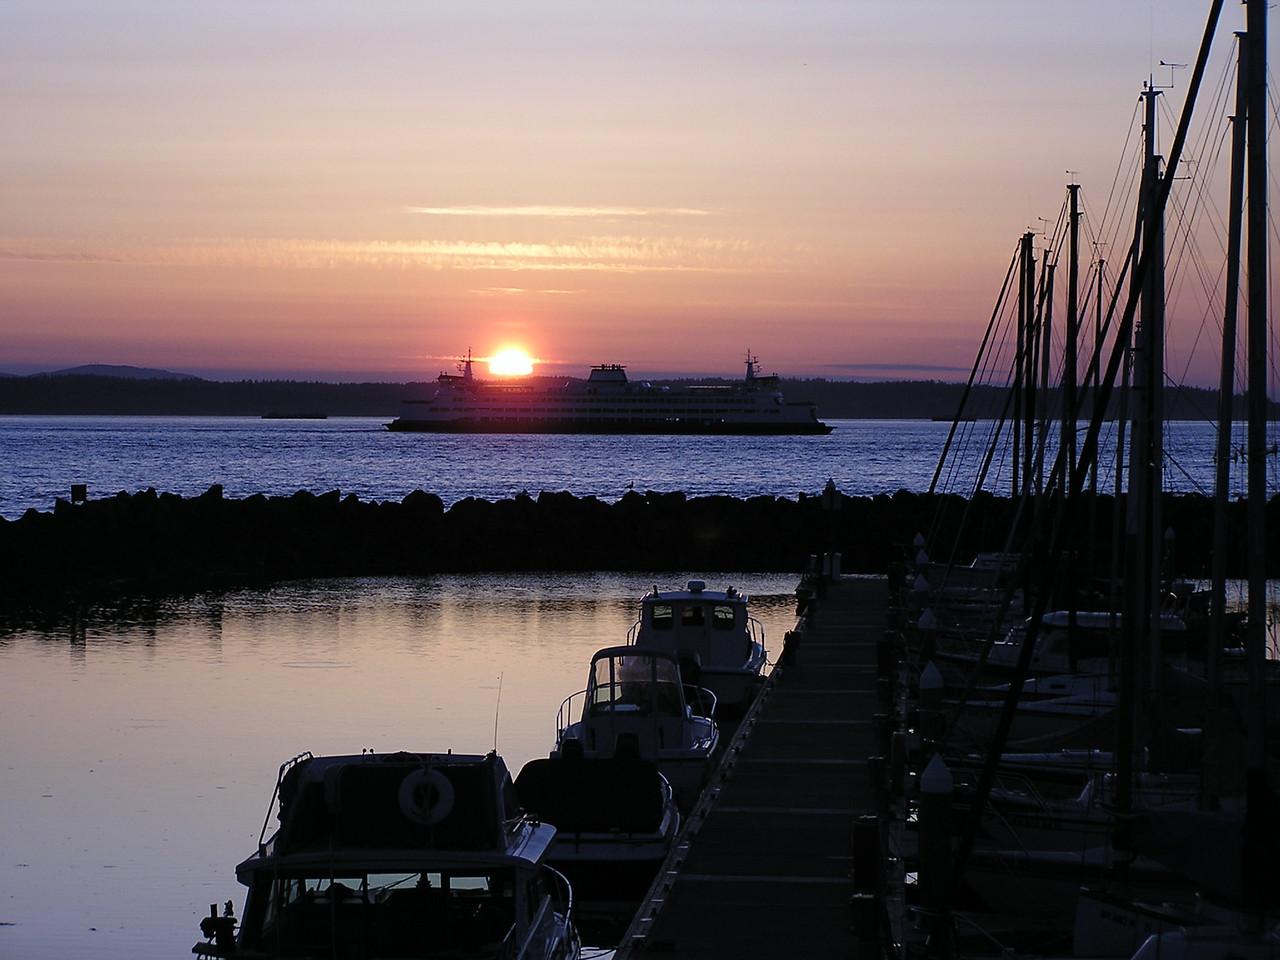 07 06 20 Sunset 006